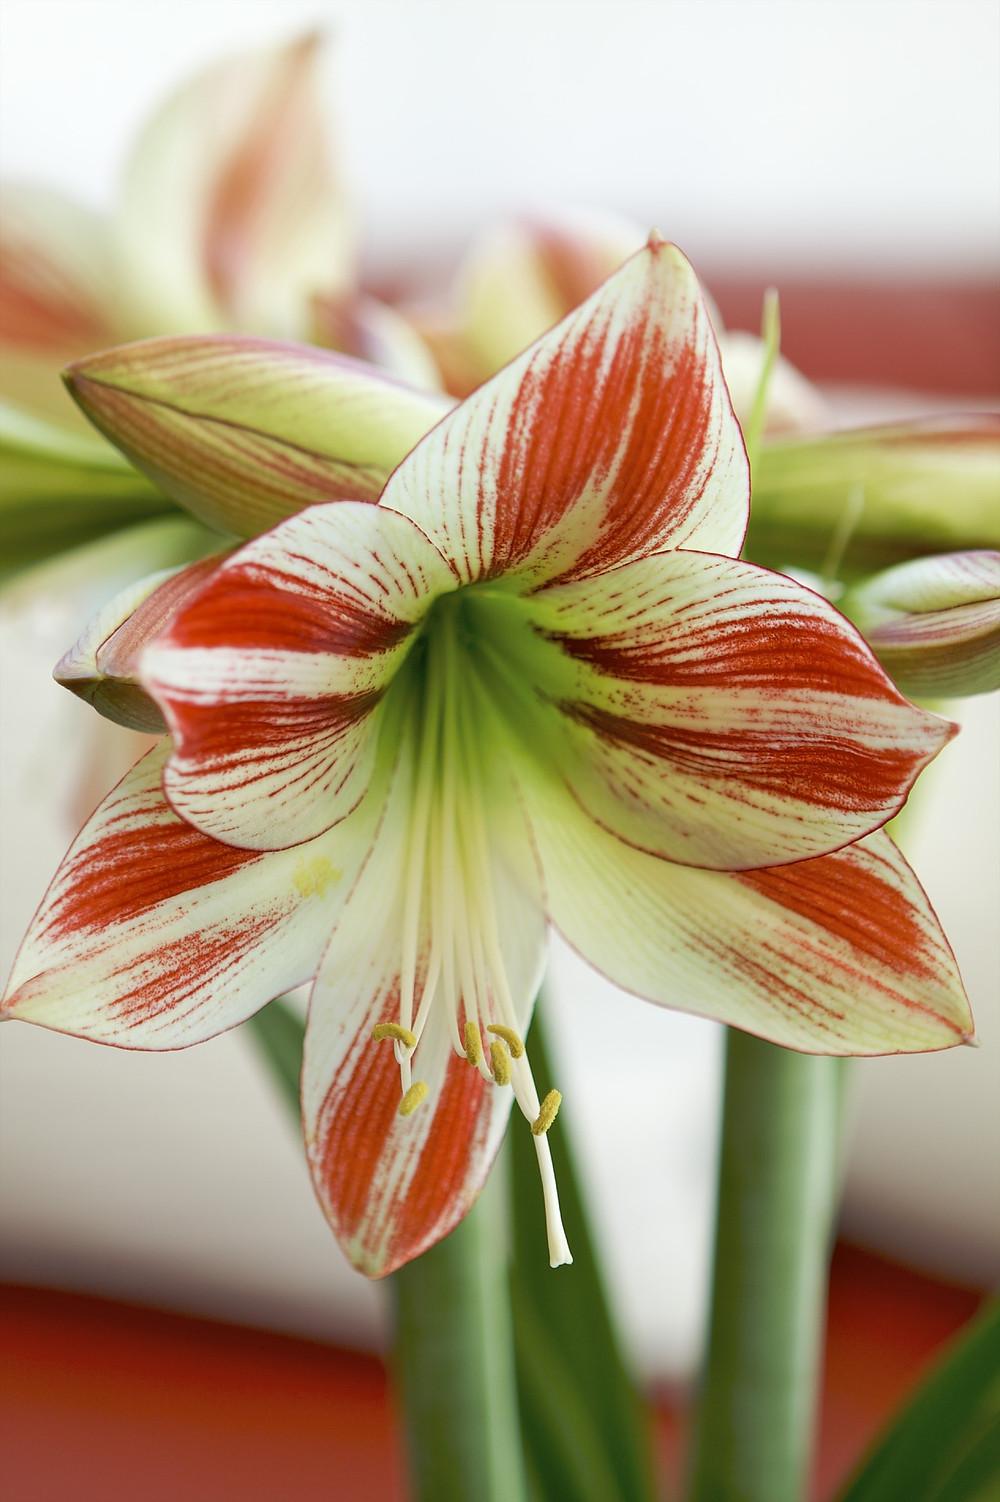 Blooming Amaryllis (Hippeastrum)